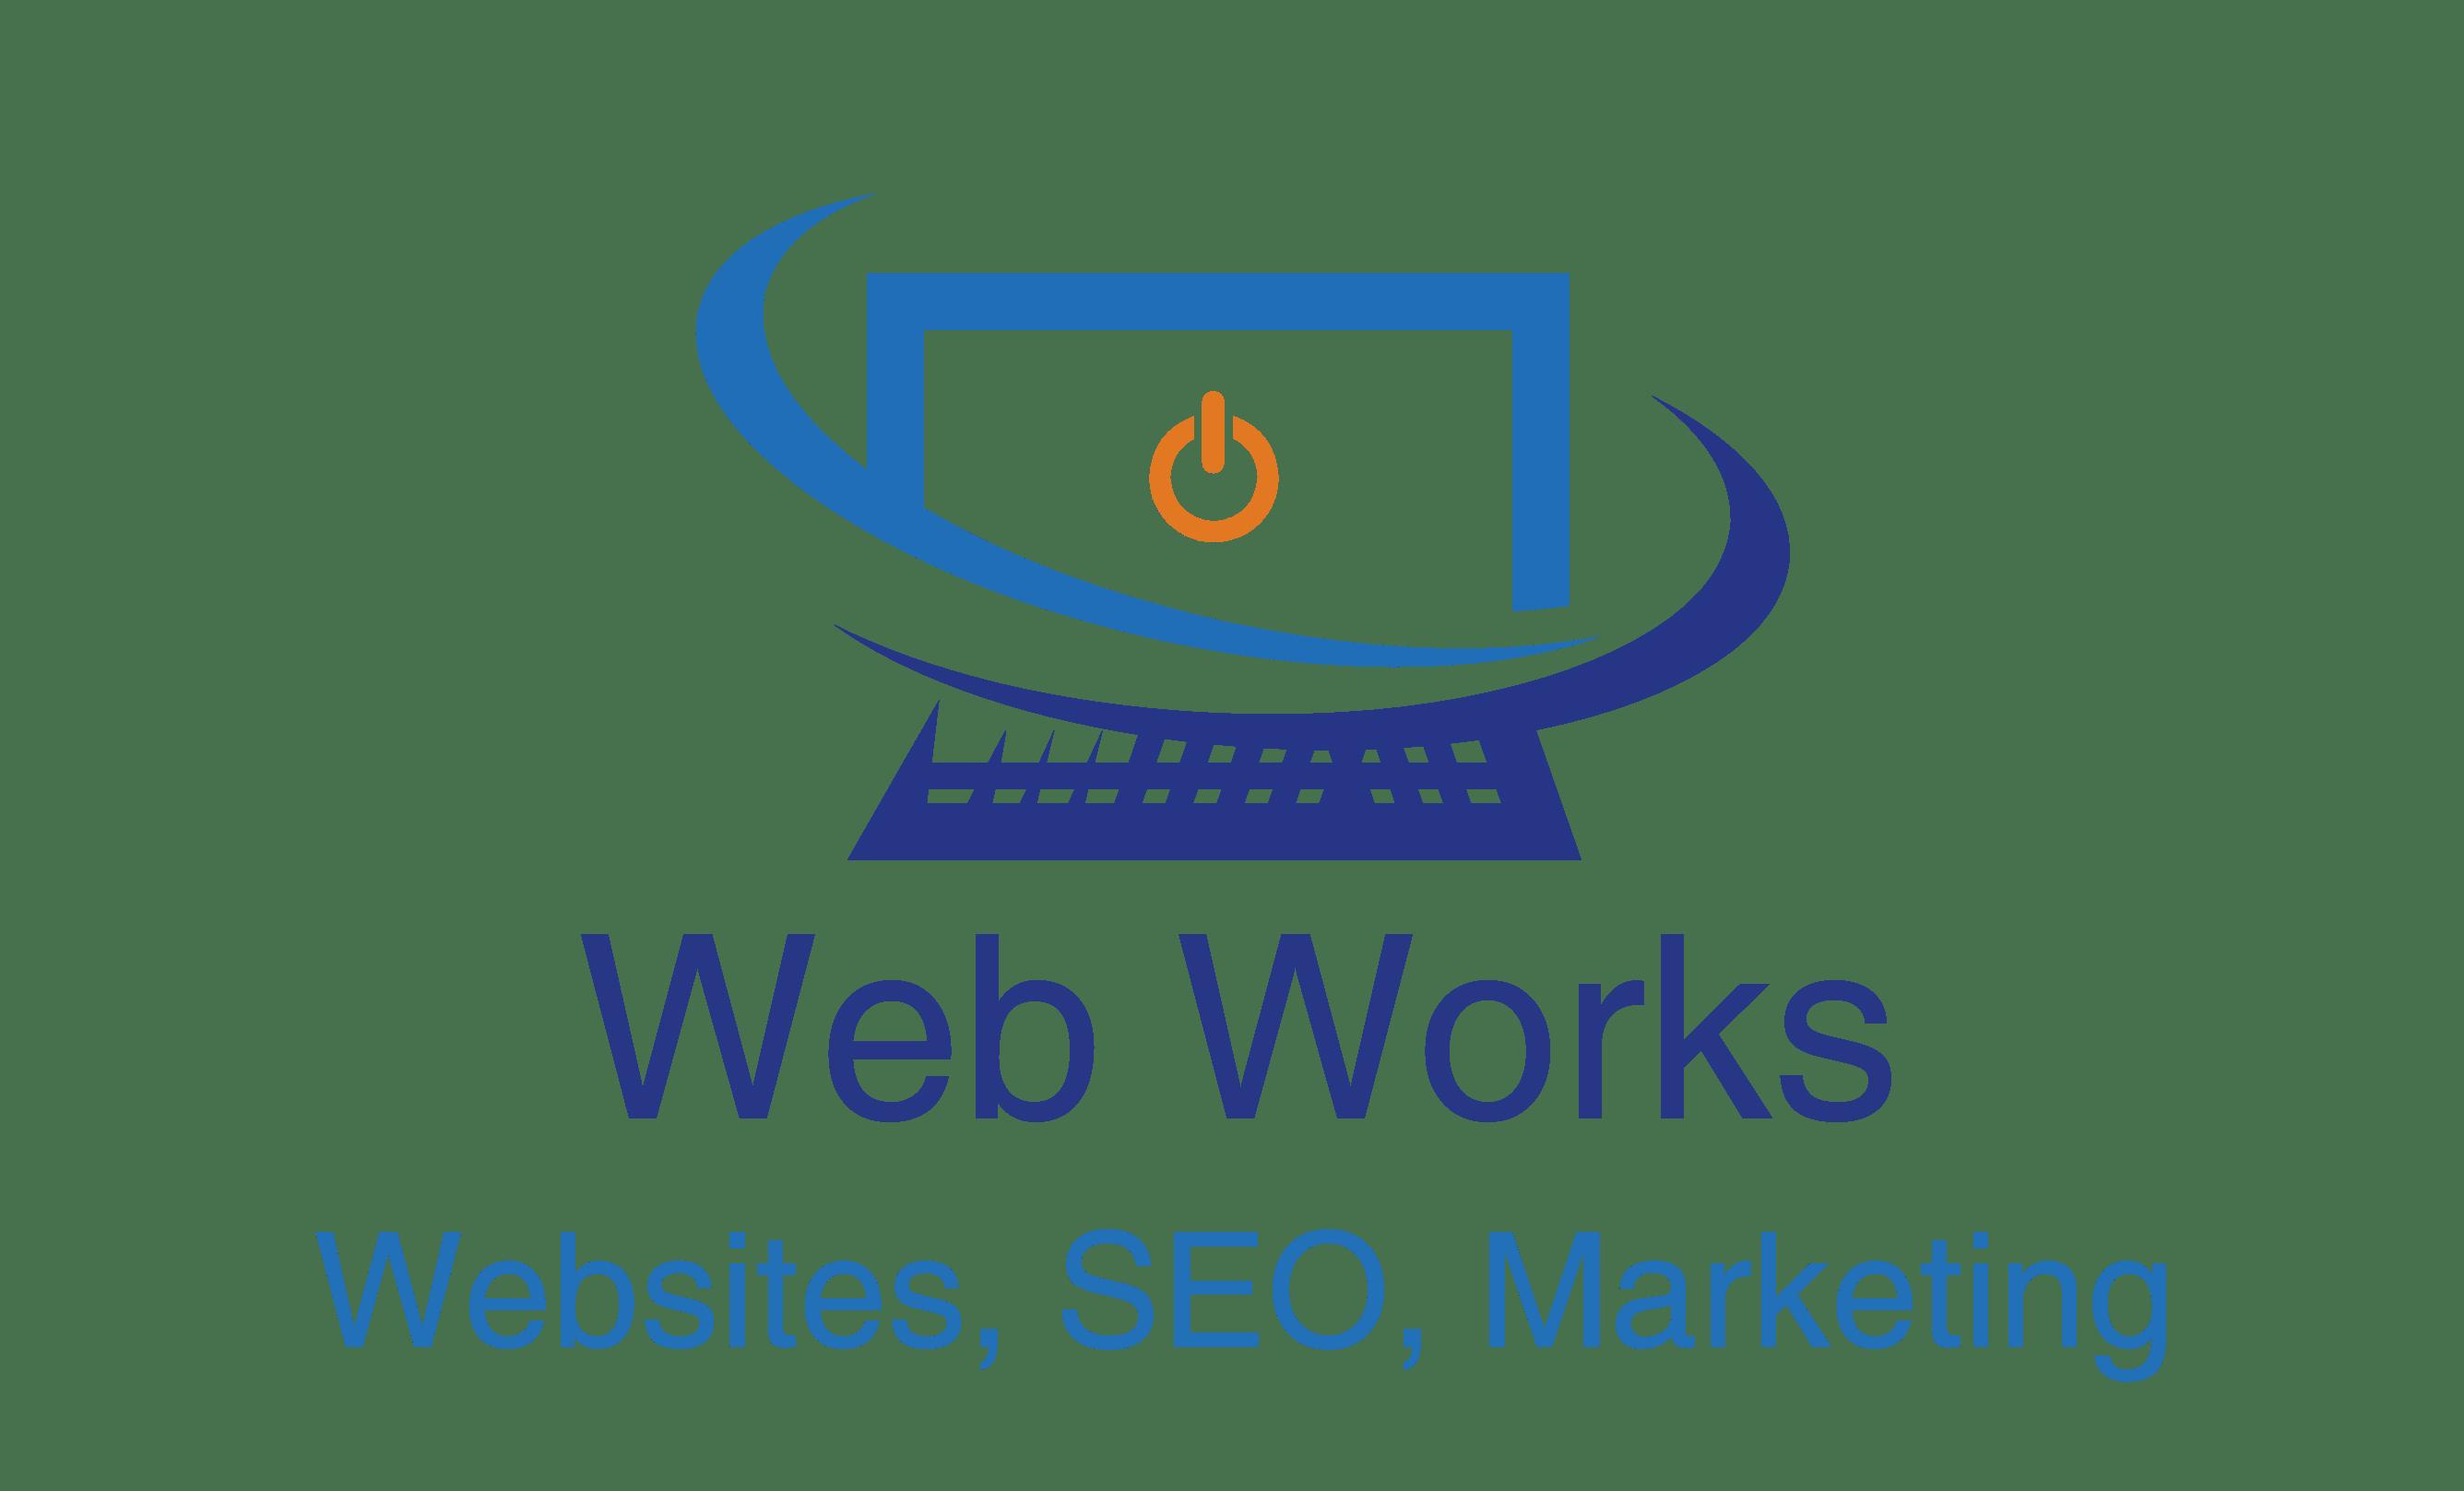 Web Works